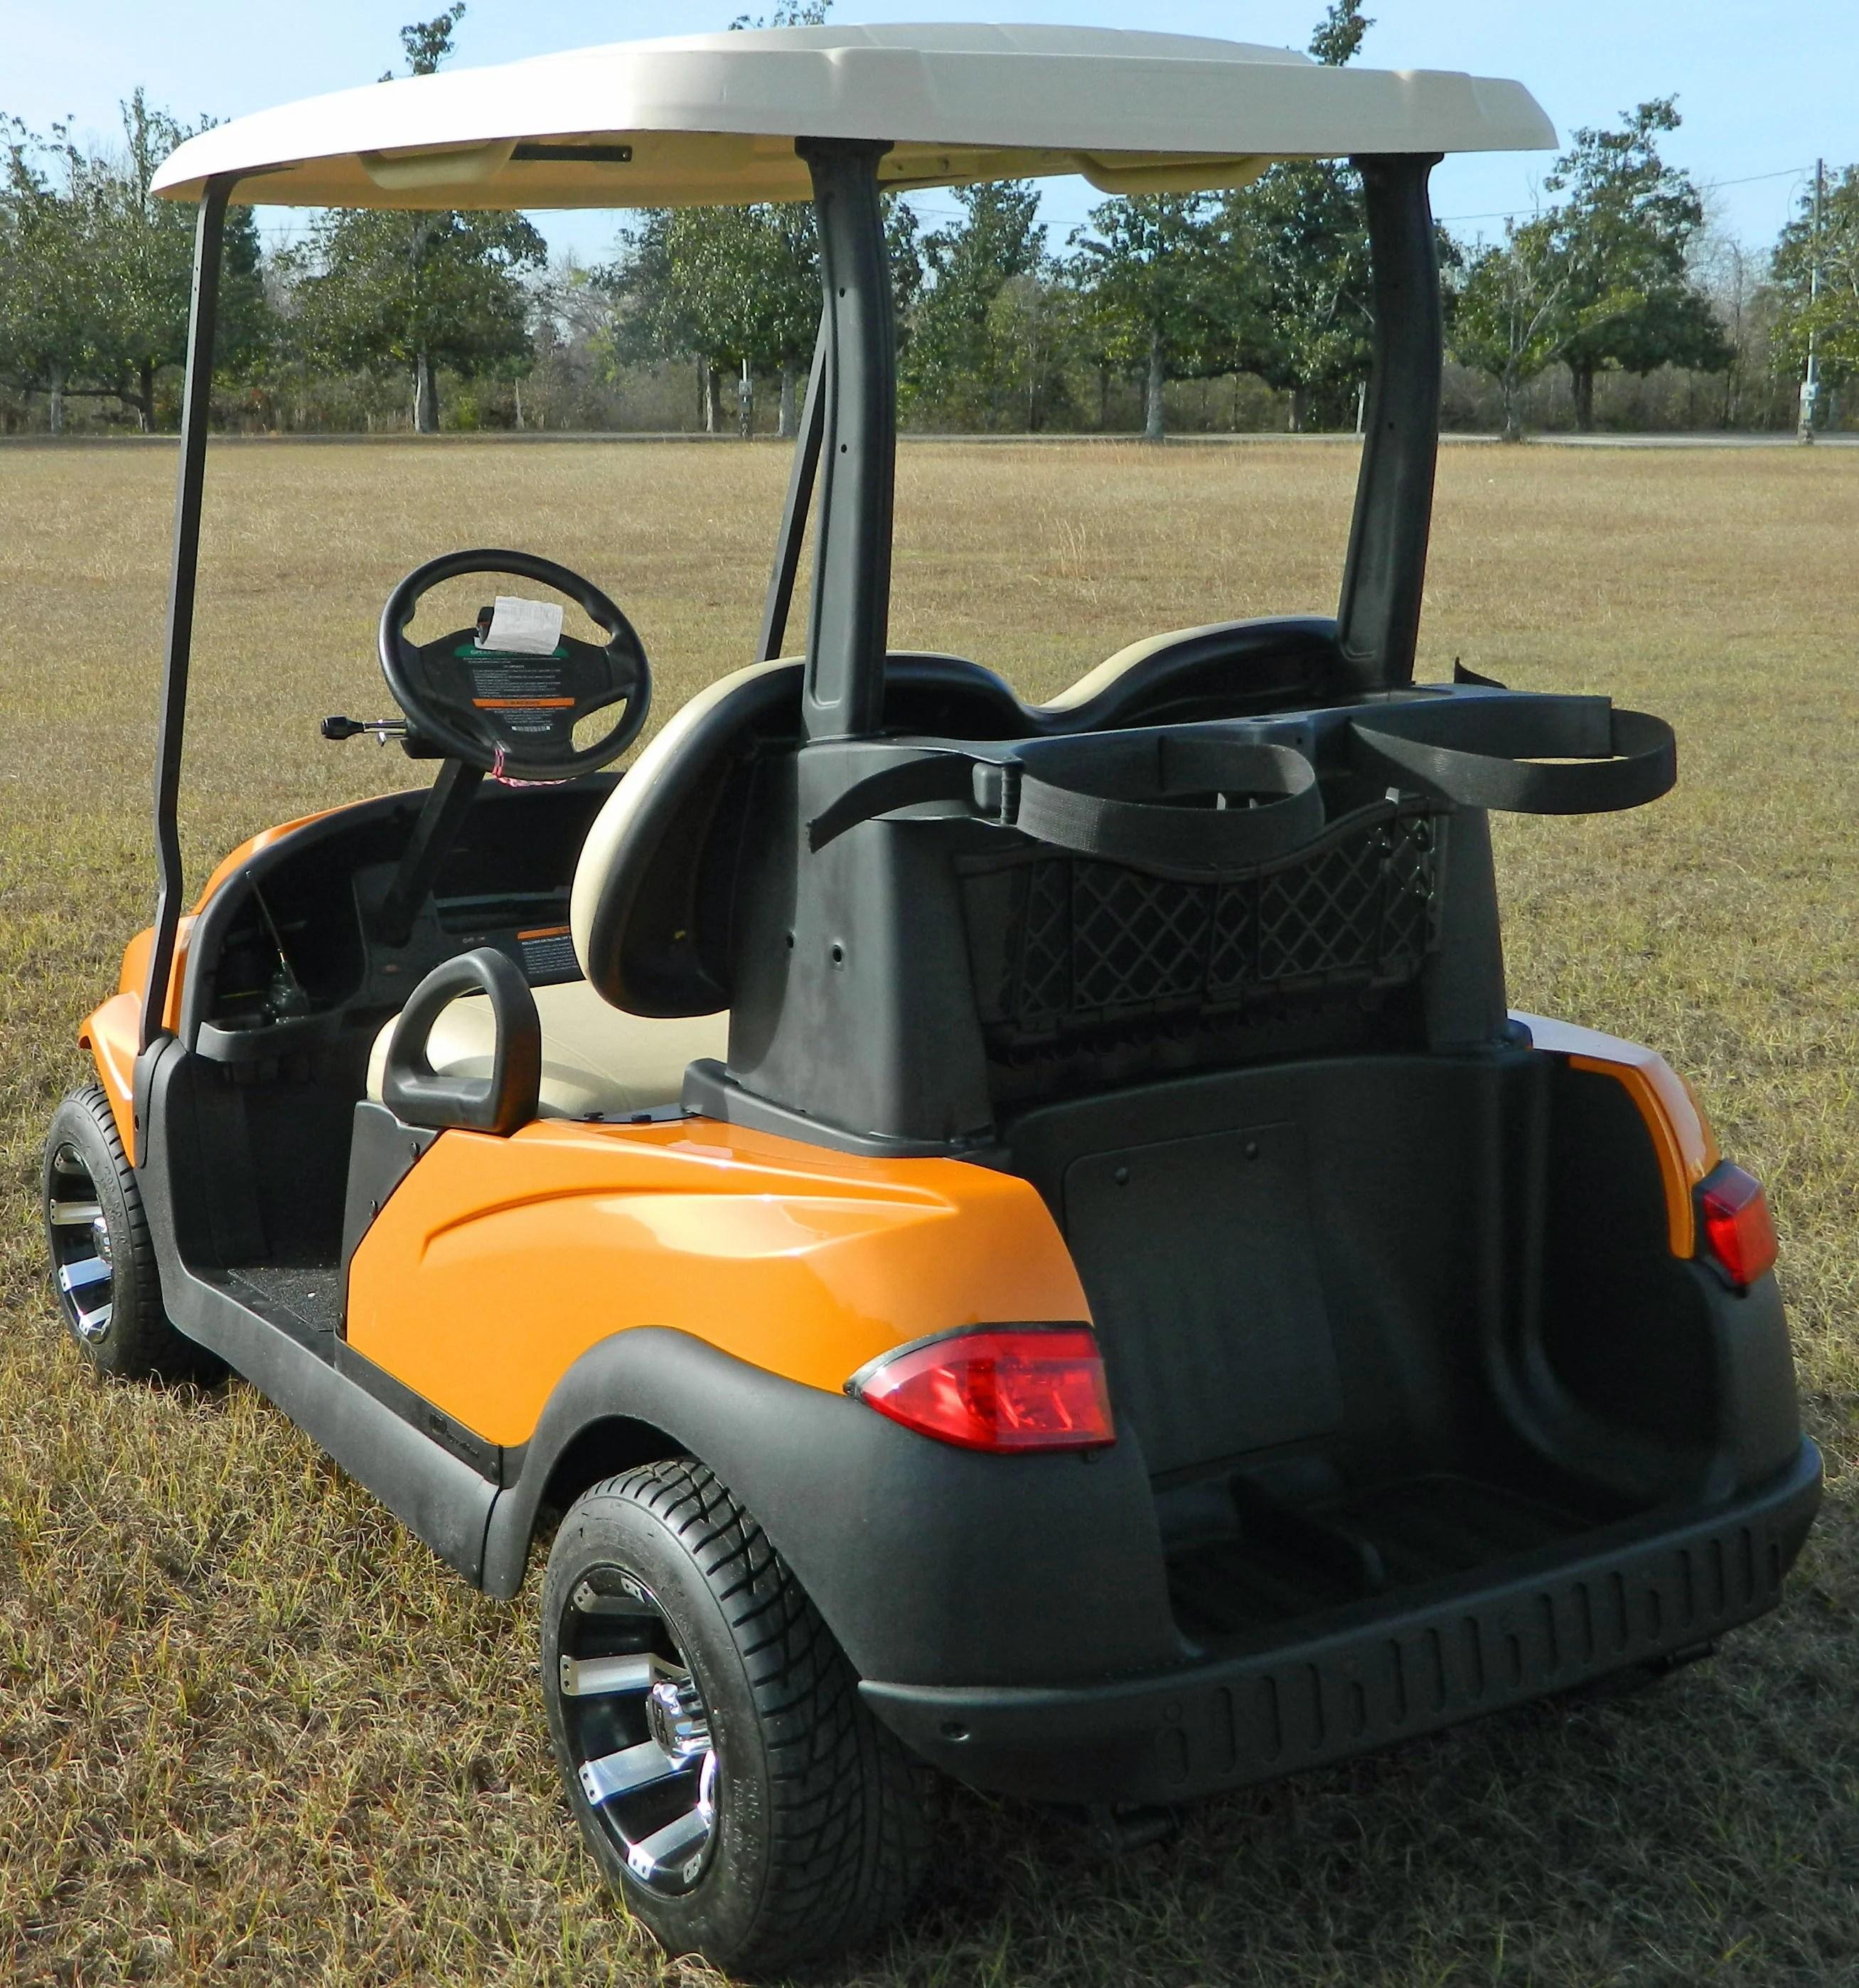 club car precedent horn wiring diagram vectra b towbar rchamp body kit mr golf carts